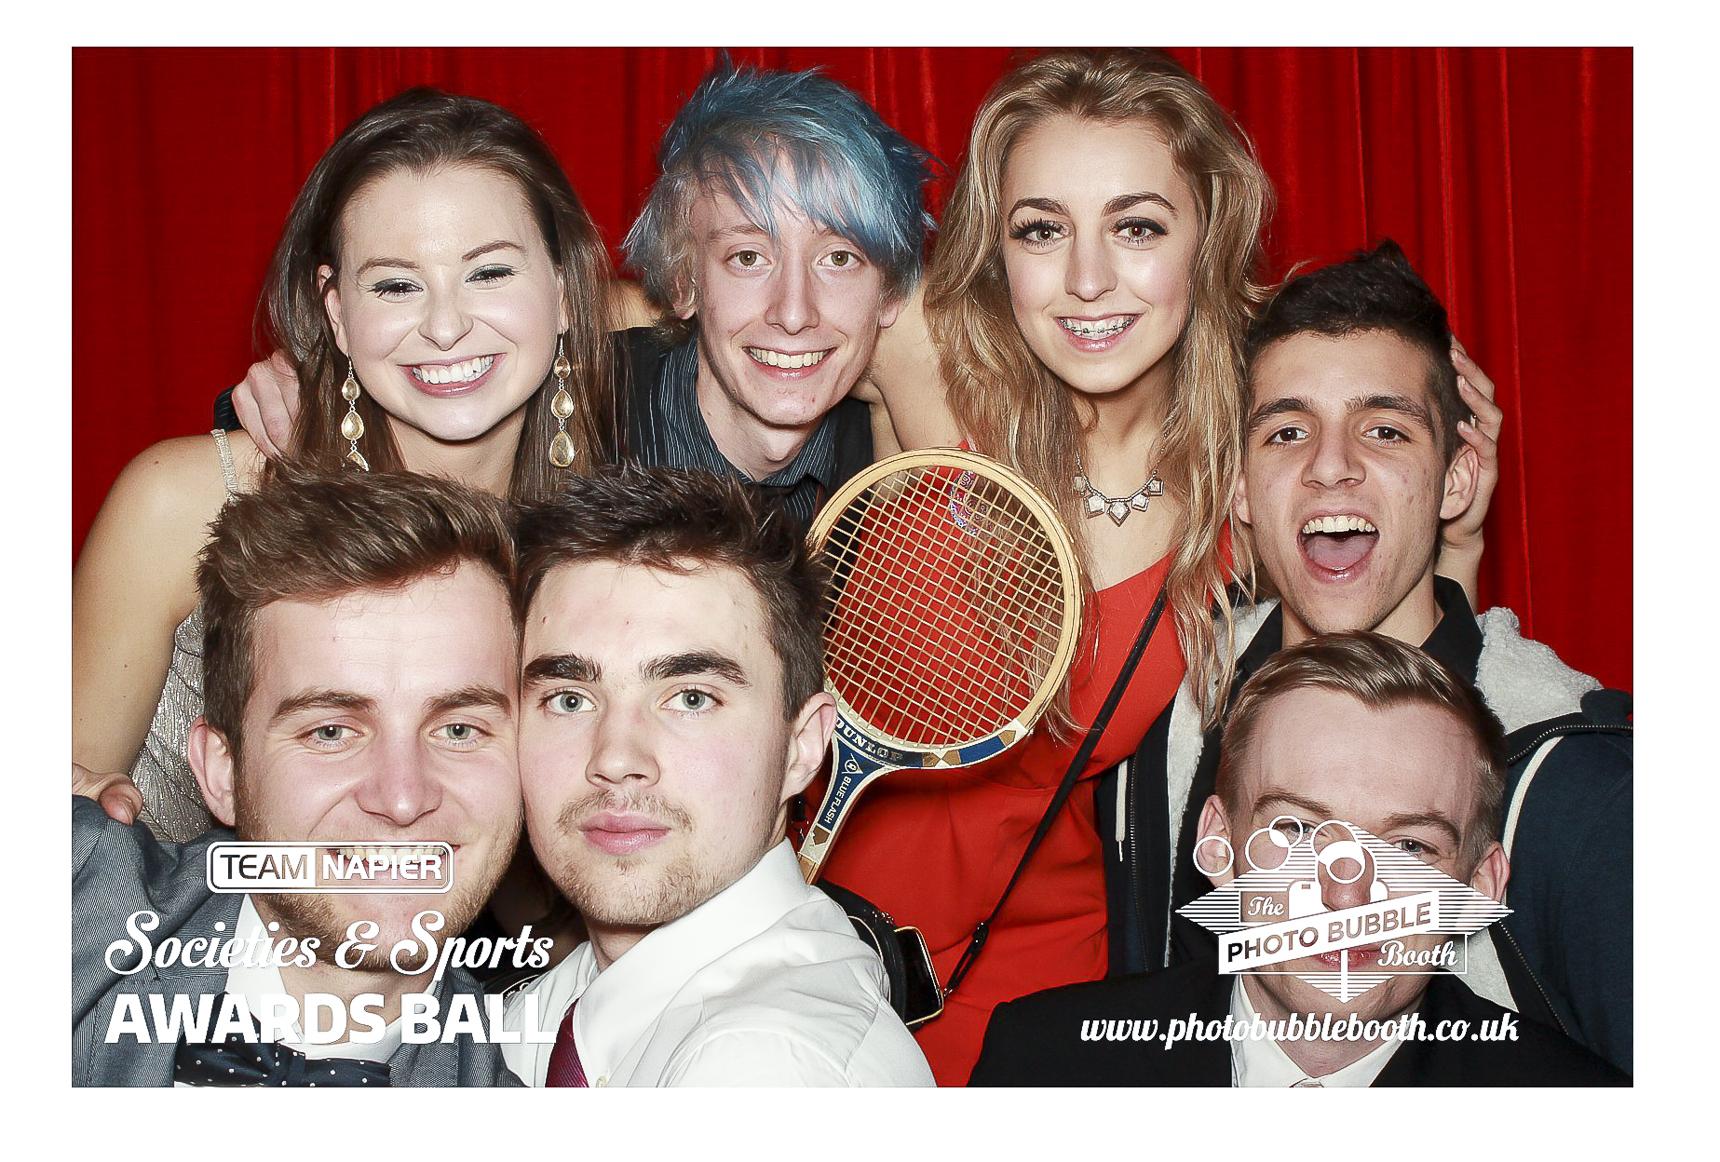 Napier Societies & Sports Awards_32.JPG